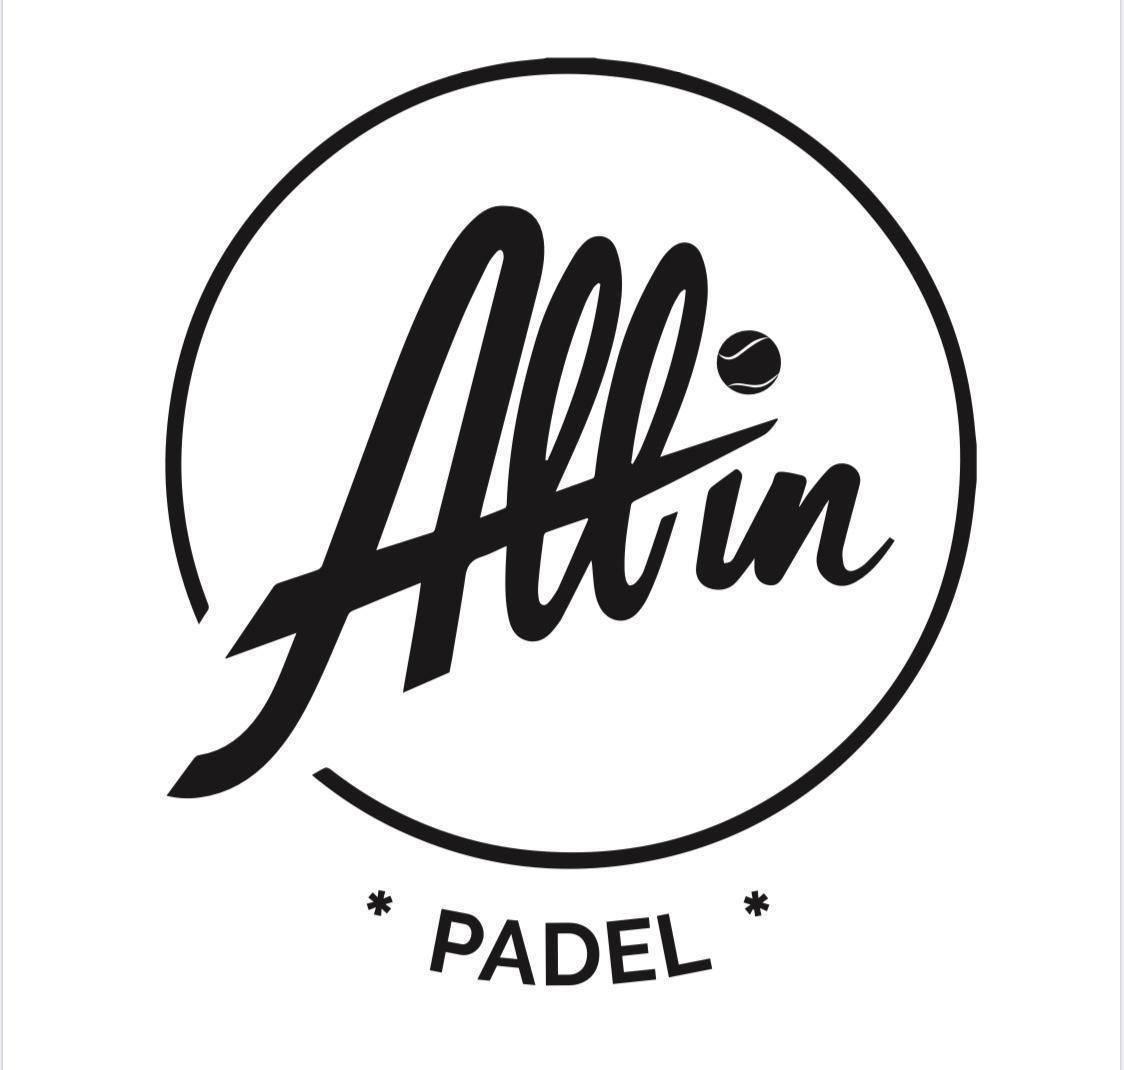 P500 miesten all -in -turnaus Padel Urheilu